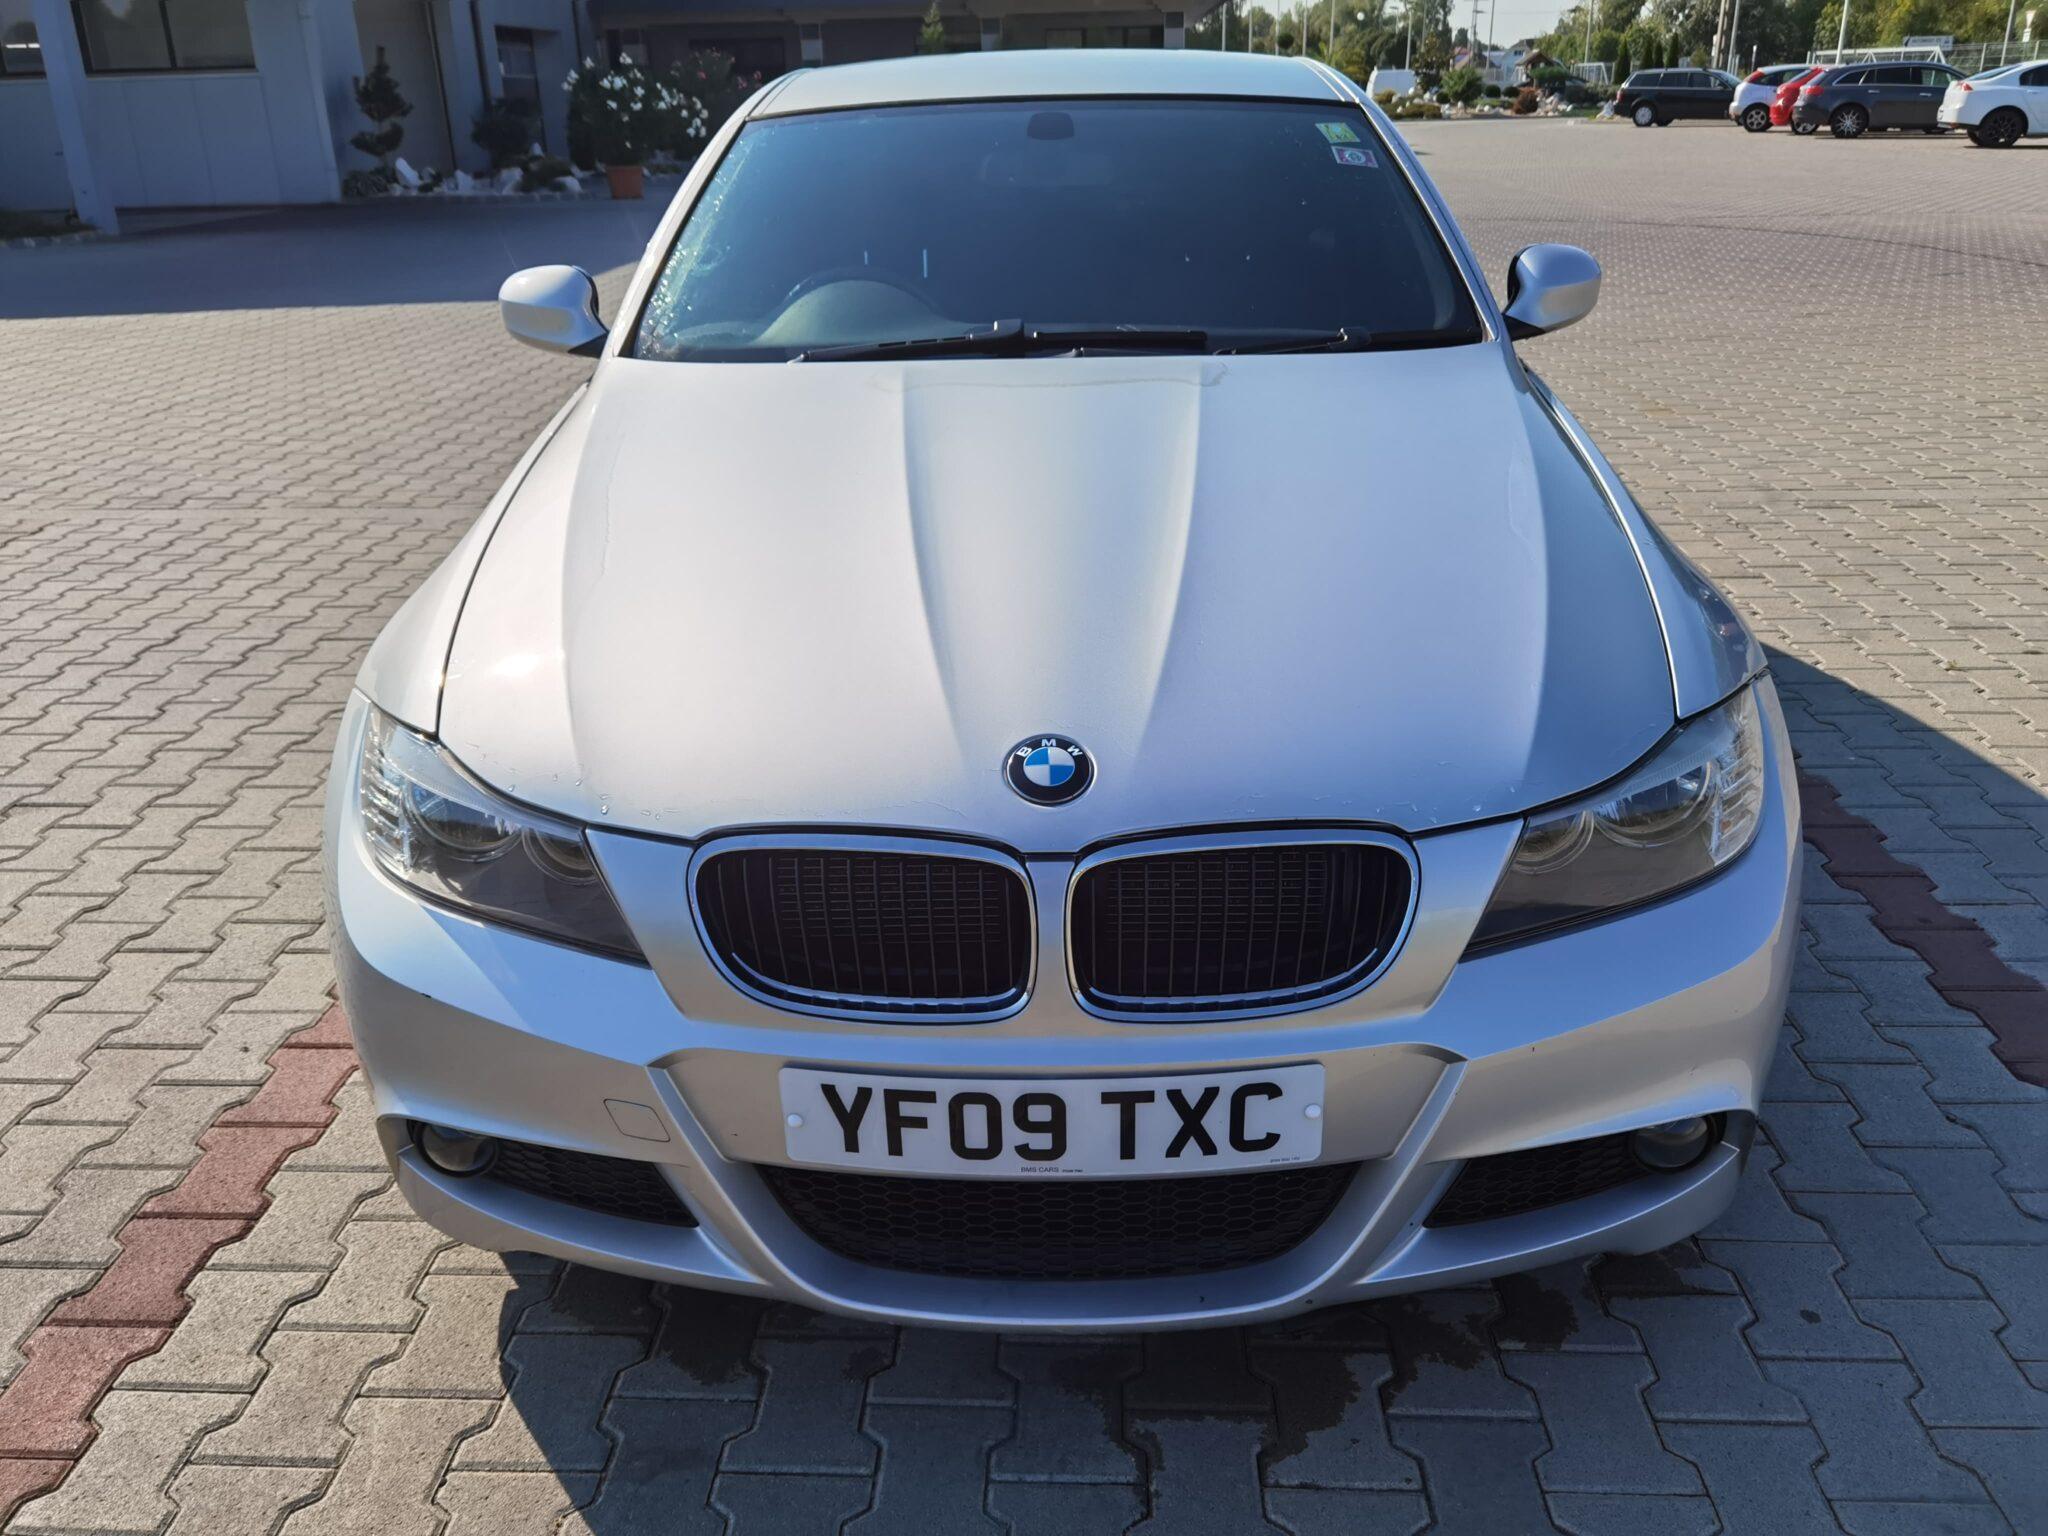 BMW E90 lci 318d Carbon Car Center Békéscsaba-3